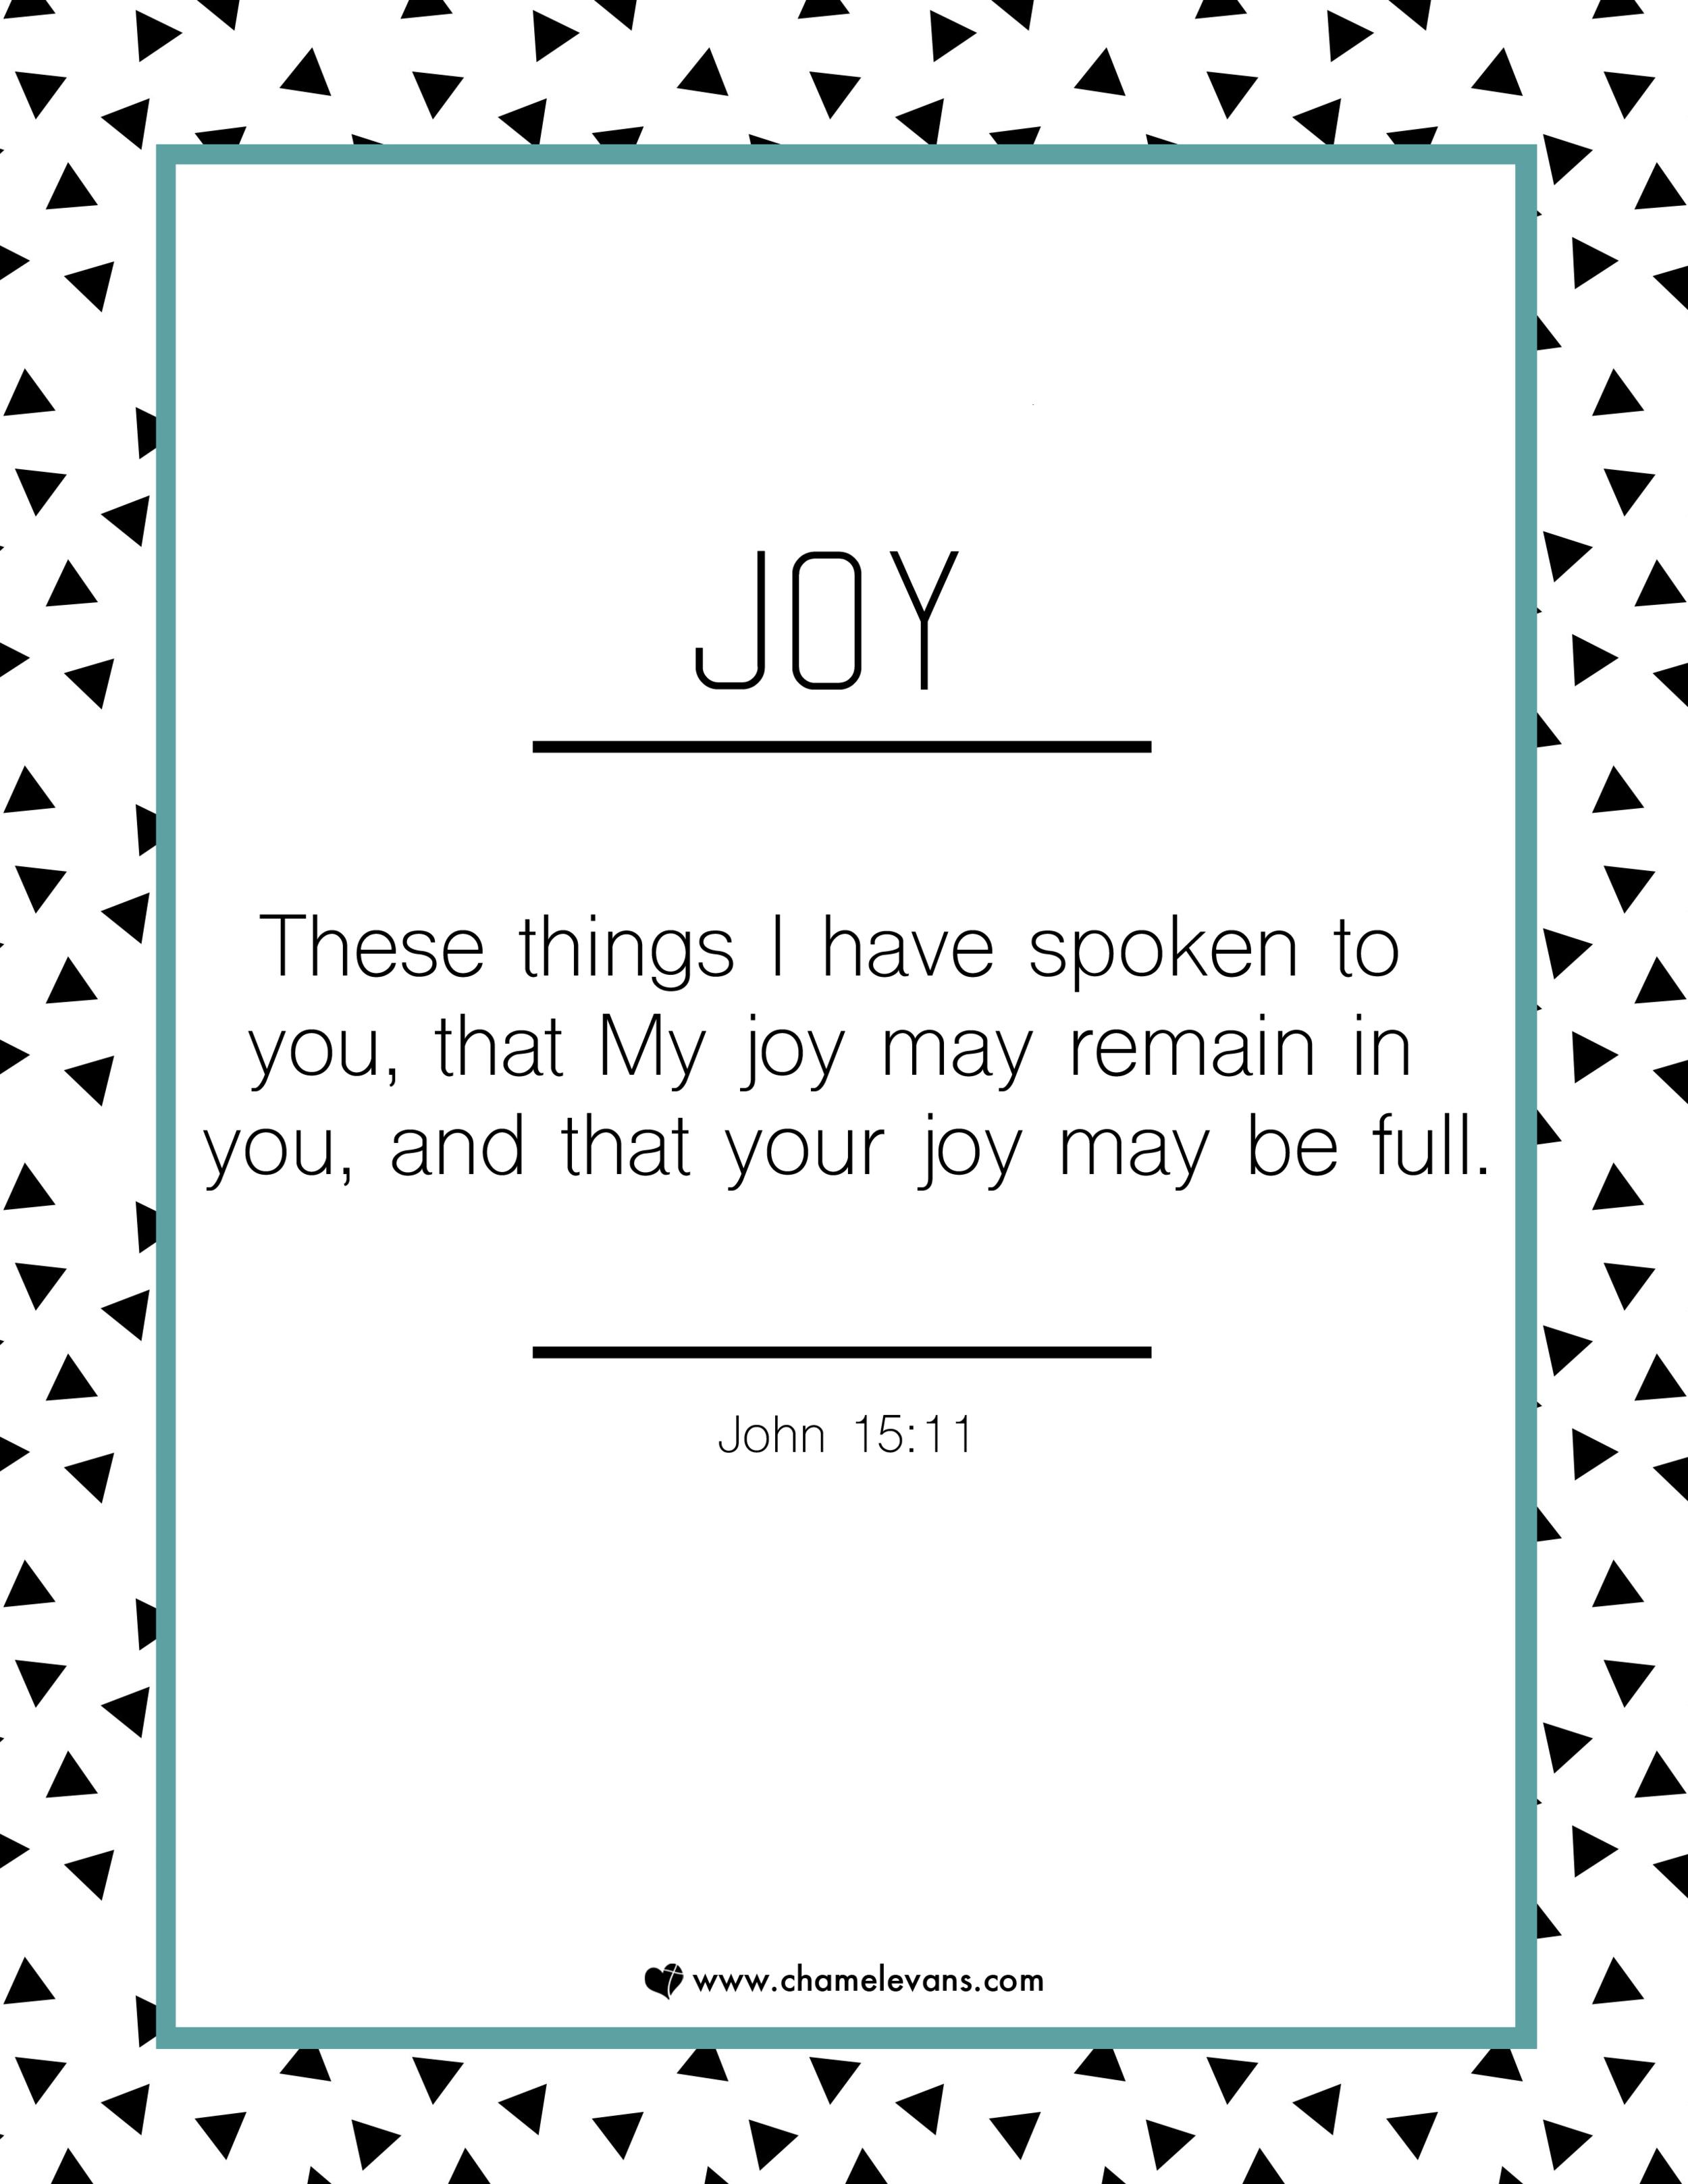 FREE SCRIPTURE ART PRINTABLES - joy  - STAND IN GOD'S TRUTH | WWW.CHAMELEVANS.COM